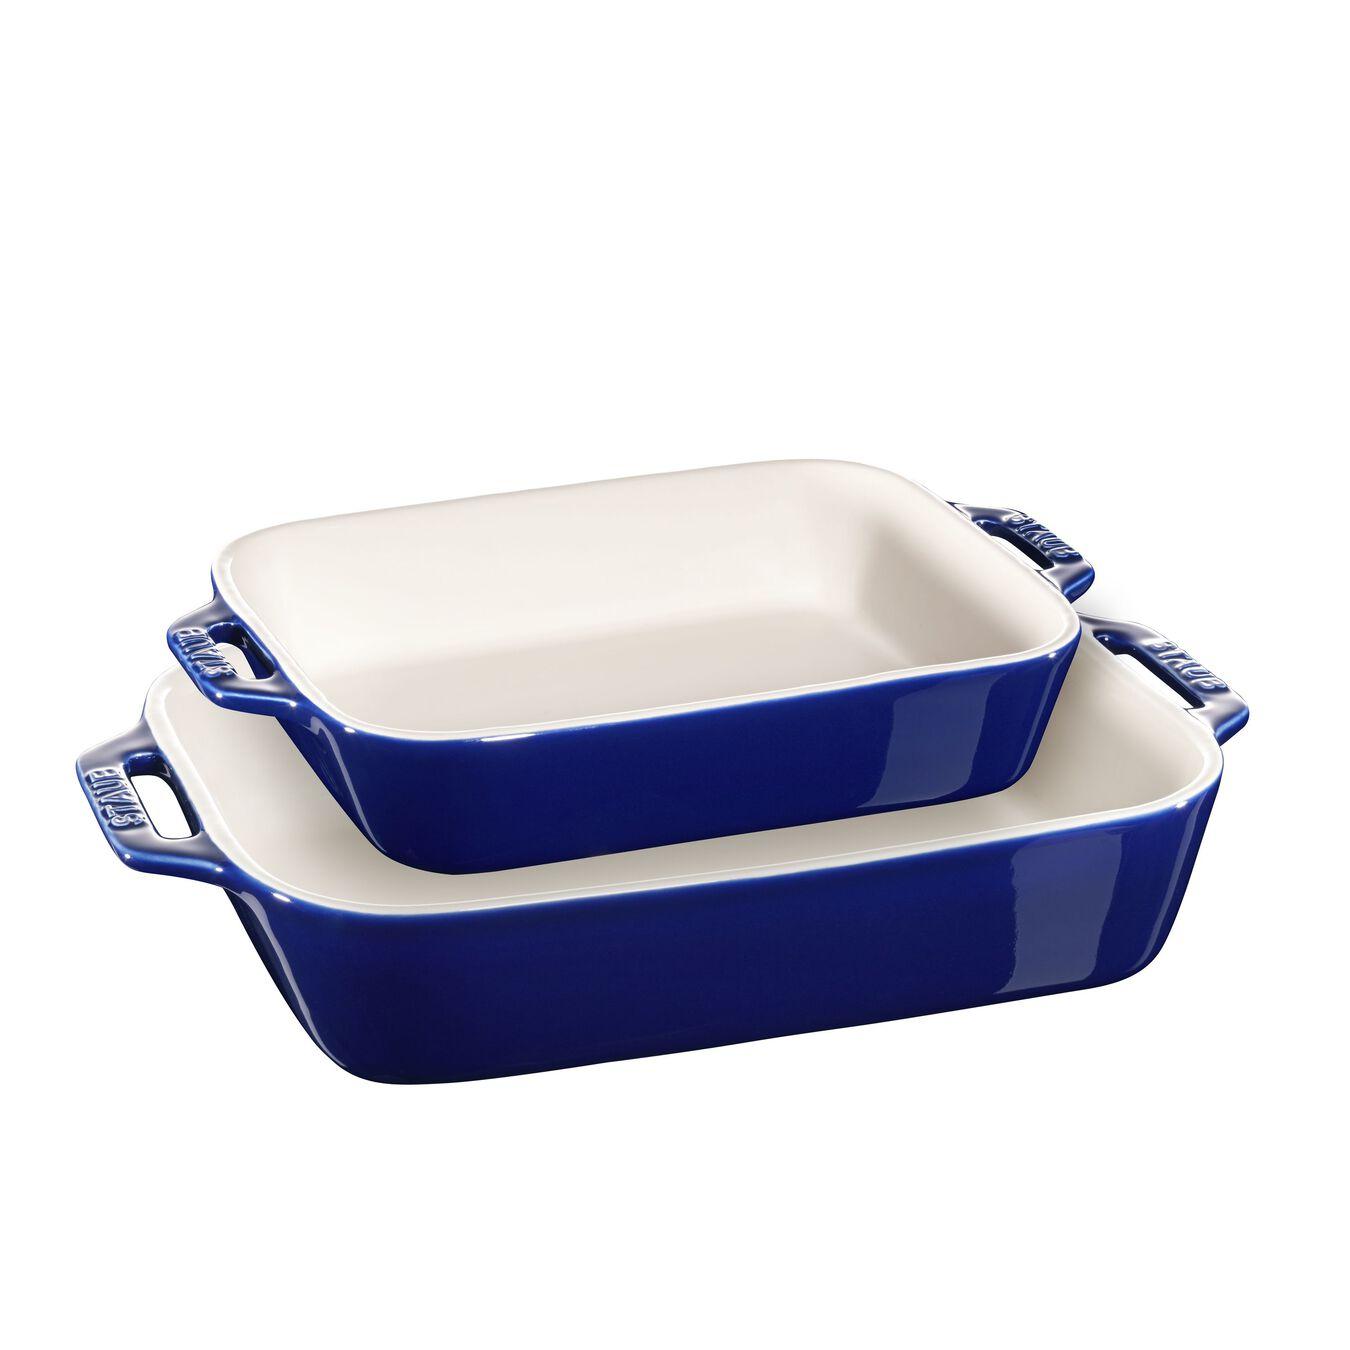 Ovenware set, 2 Piece | rectangular | dark-blue,,large 2